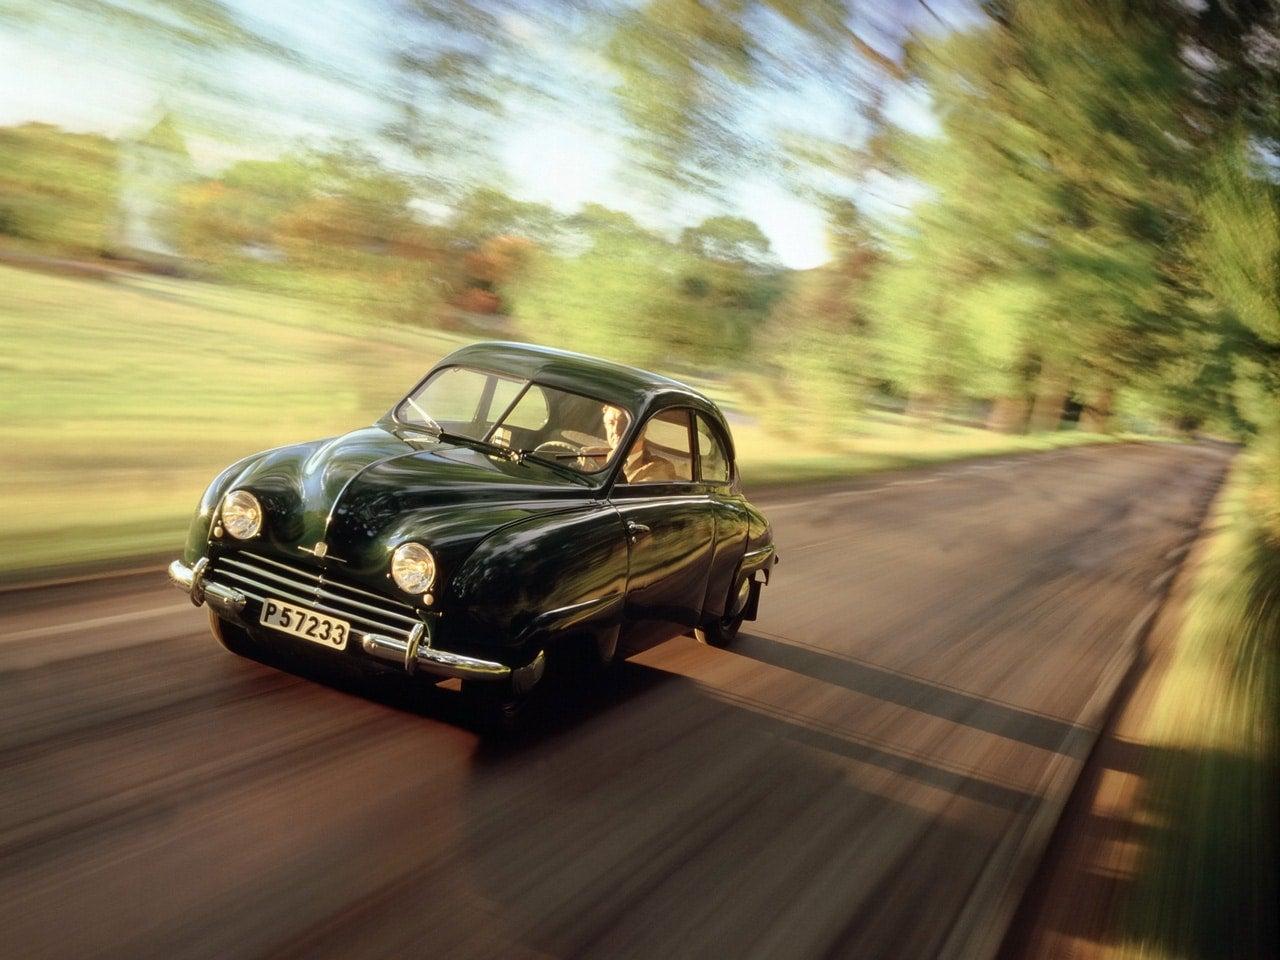 1949 1956 Saab 92 1950 Saab Calendar 1997